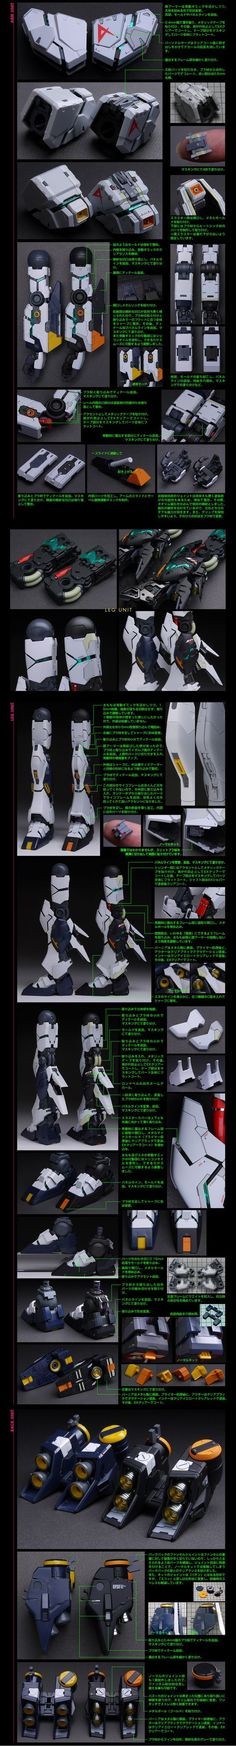 17 Best Gunpla images in 2016 | Gundam, Gundam model, Scale